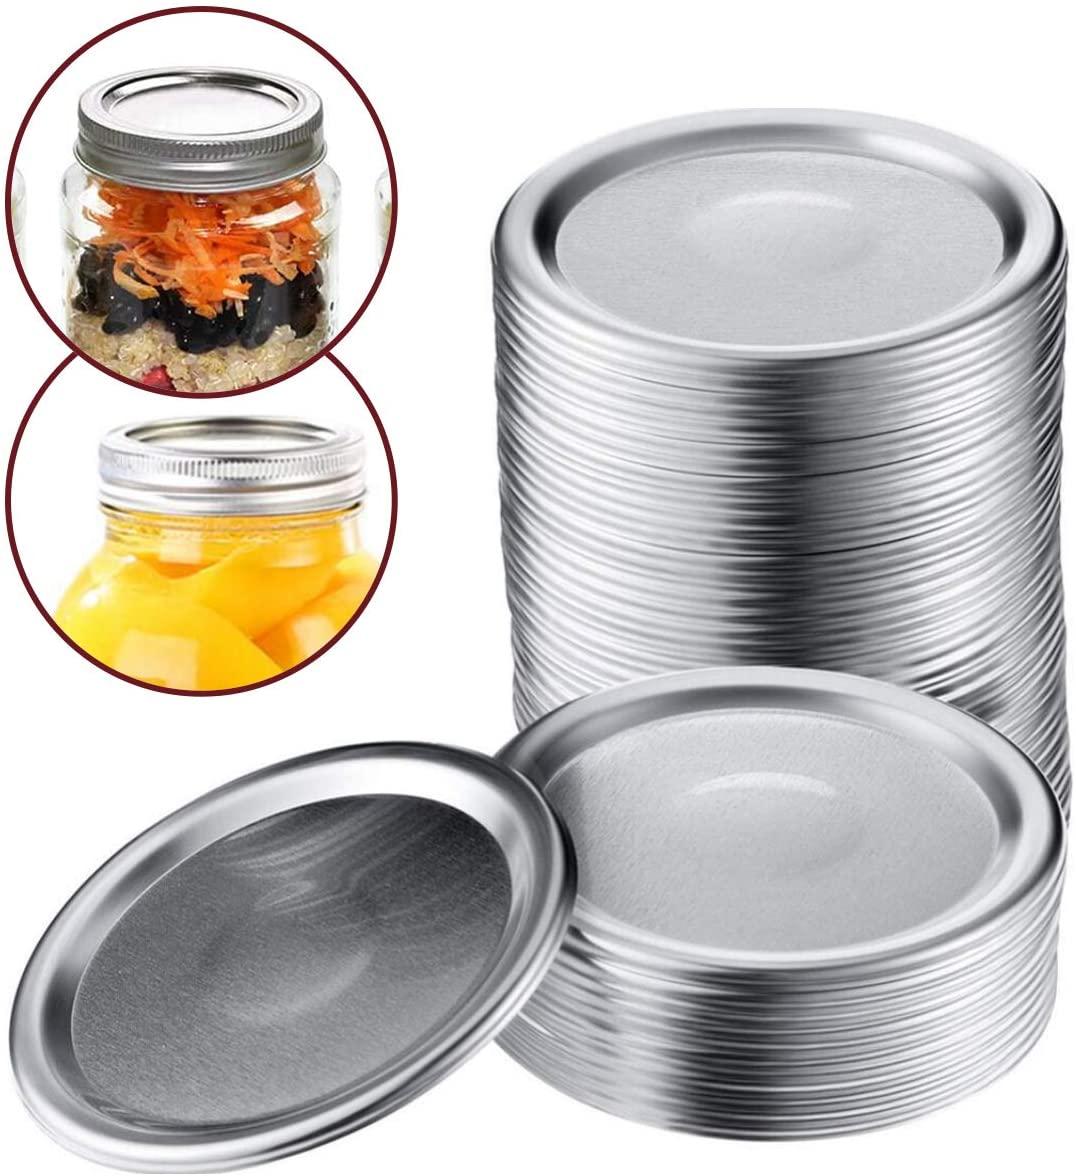 ZYP 48Pcs Regular Mouth Canning Lids, Mason Jar Lids Split-type Lids Leak Proof, Secure Canning Jar Caps (70mm/2.75in)